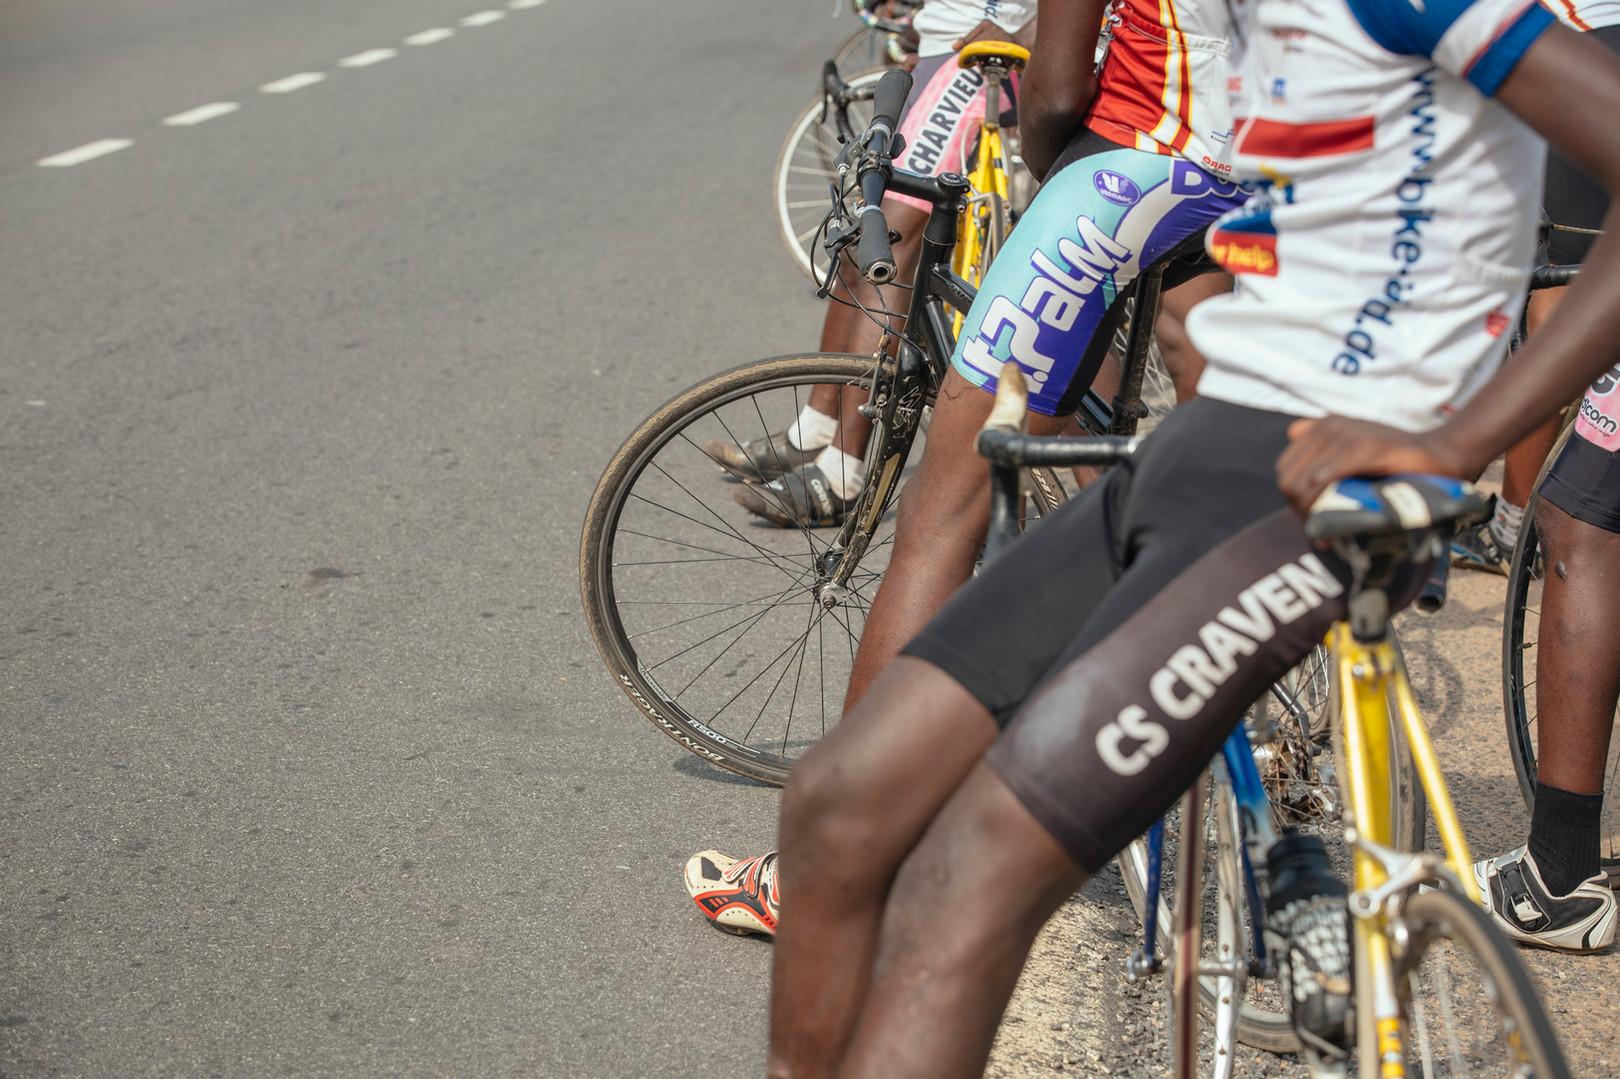 0259_Togo_KpaliméCyclingProject_20151221